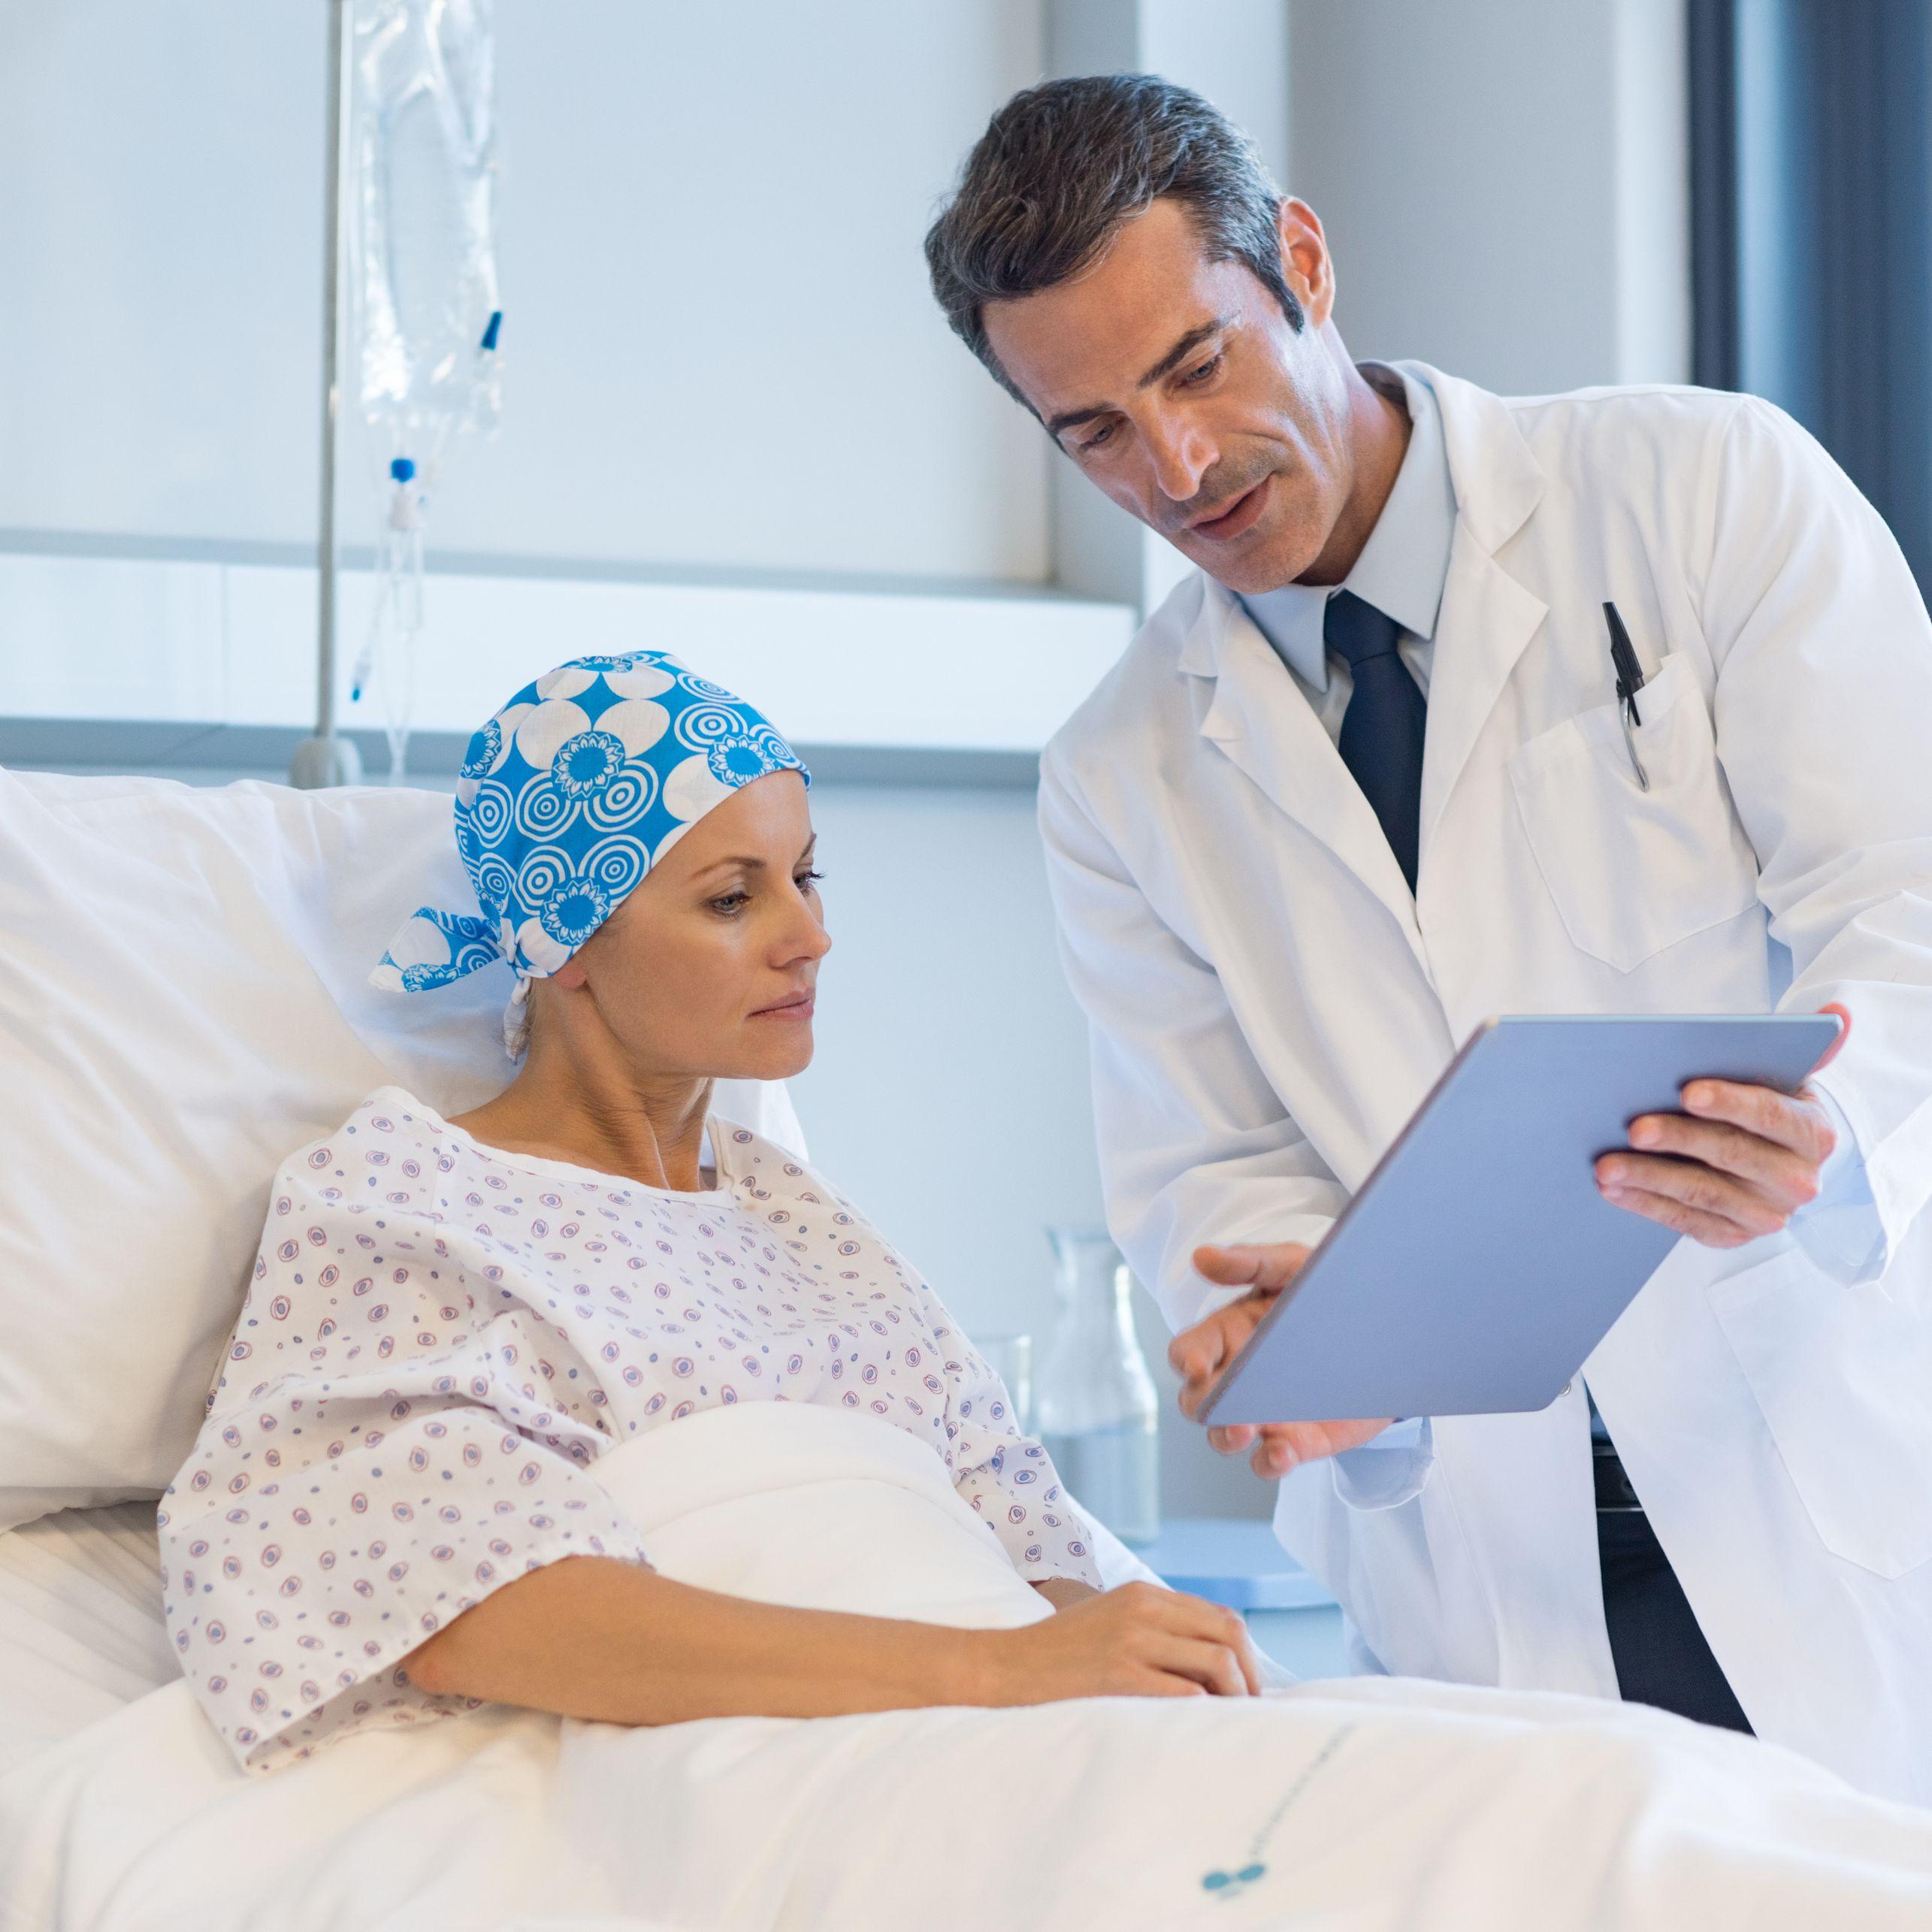 peritoneal cancer treatments